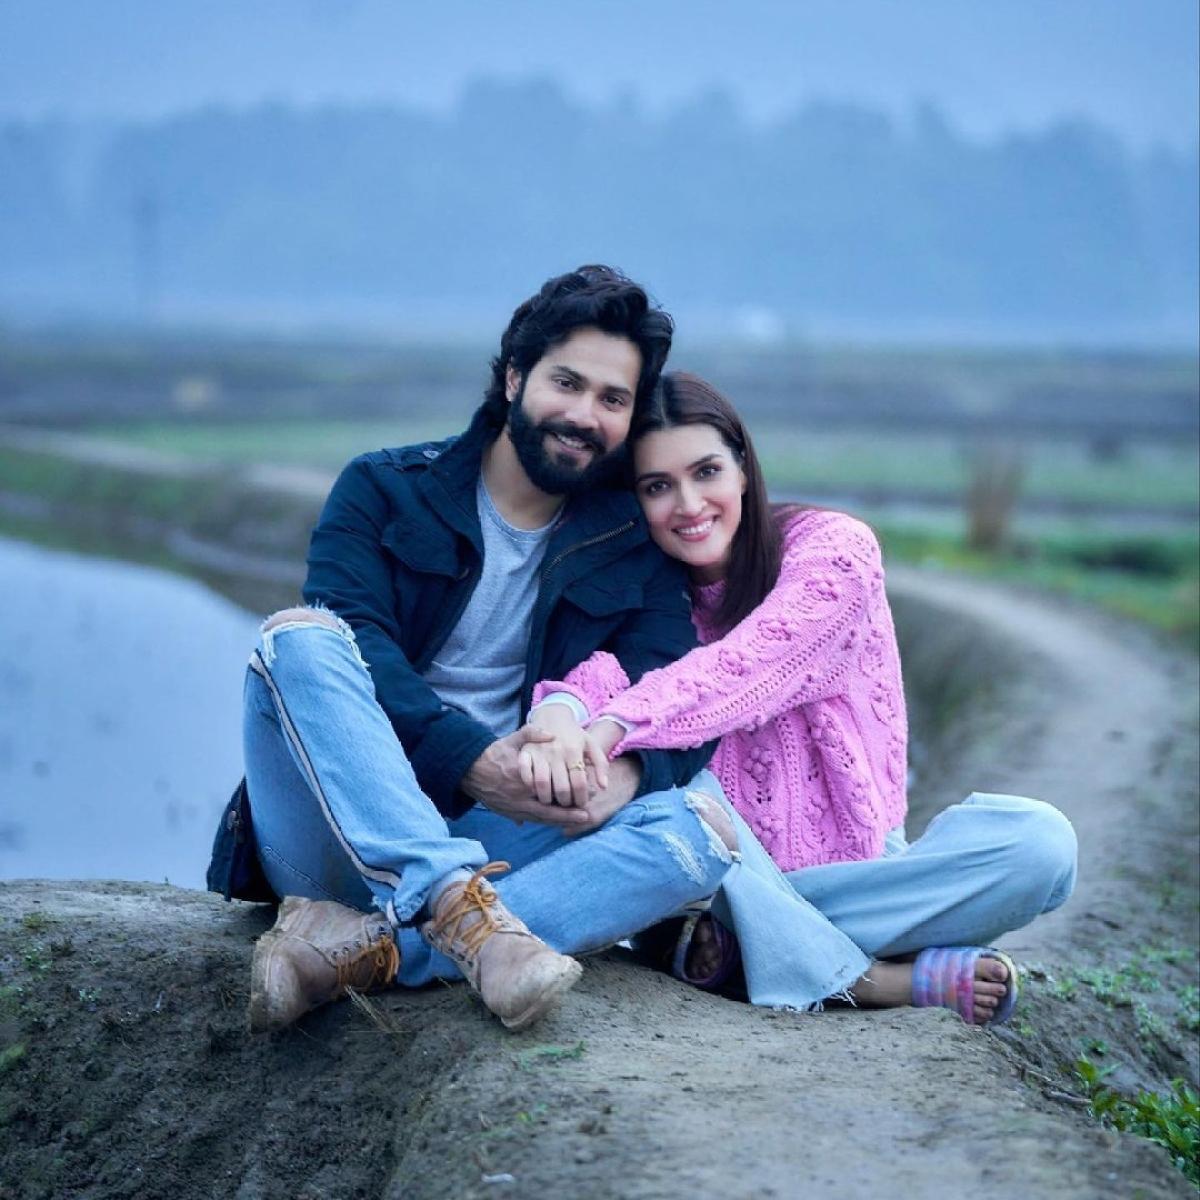 Kriti Sanon wraps up 'Bhediya' schedule, pens sweet note for co-star Varun Dhawan